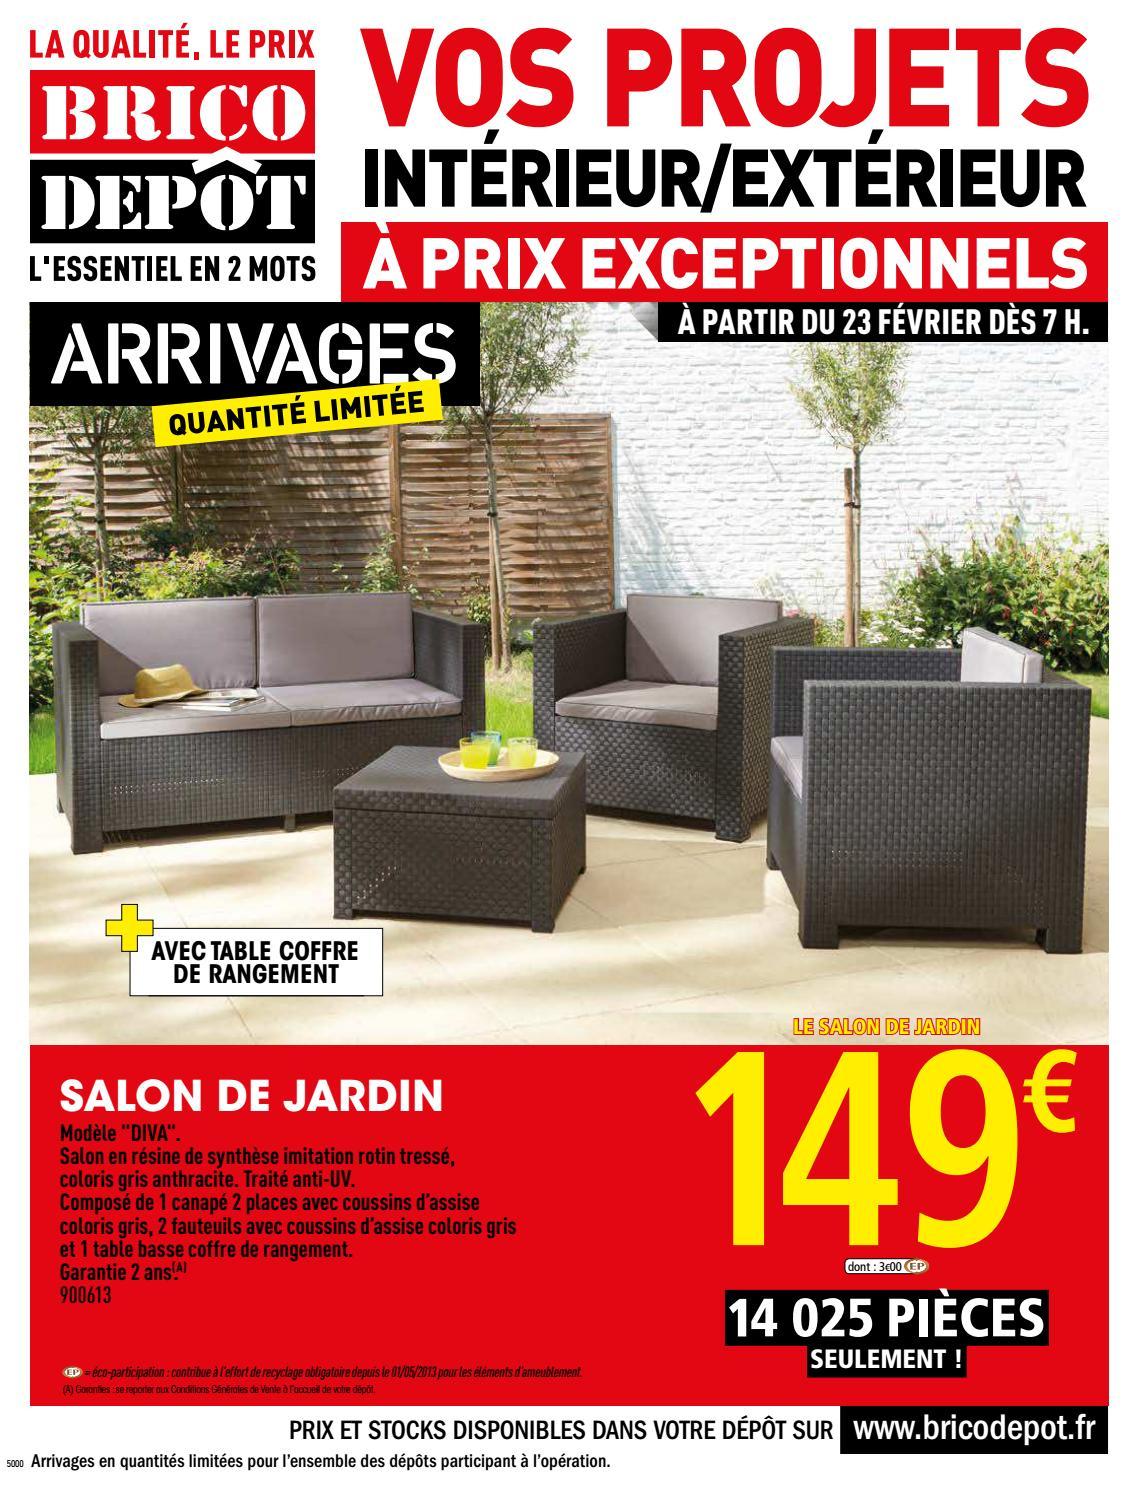 Dep230218 1 By Jan Deo - Issuu avec Regard Beton 50X50 Brico Depot